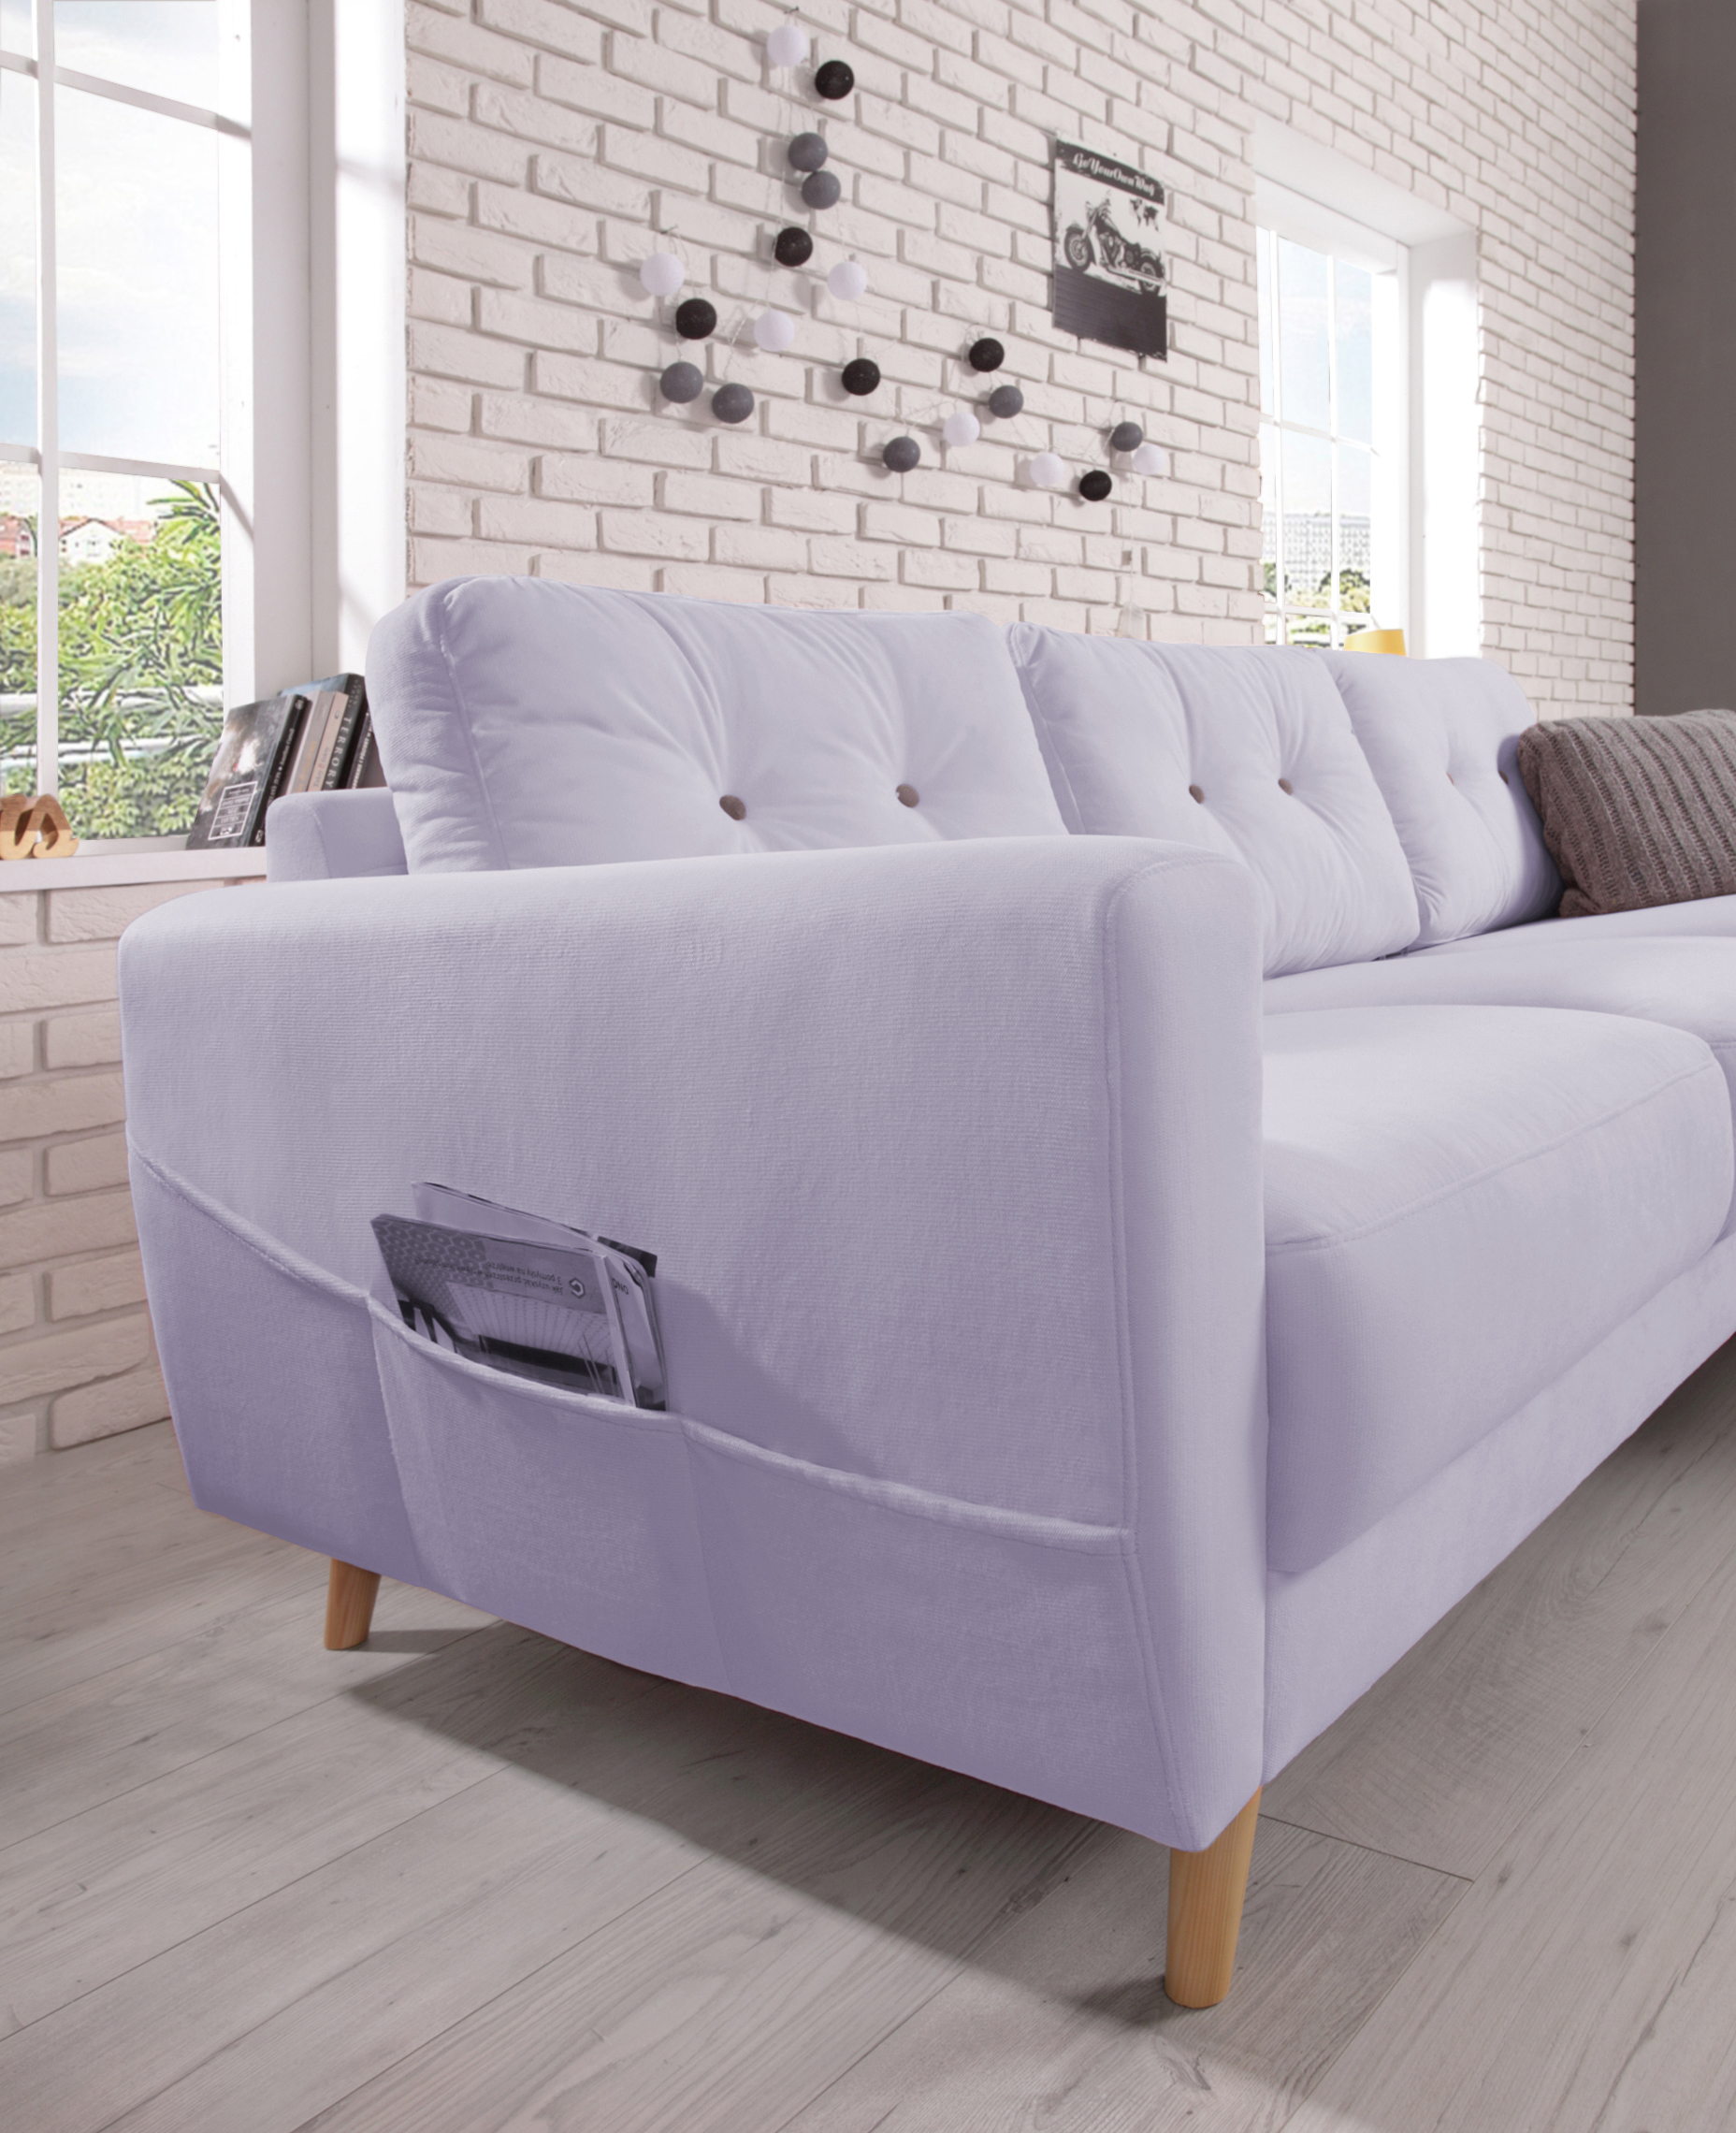 Bobochic oslo canap d angle gauche violet poudr - Canape d angle violet ...